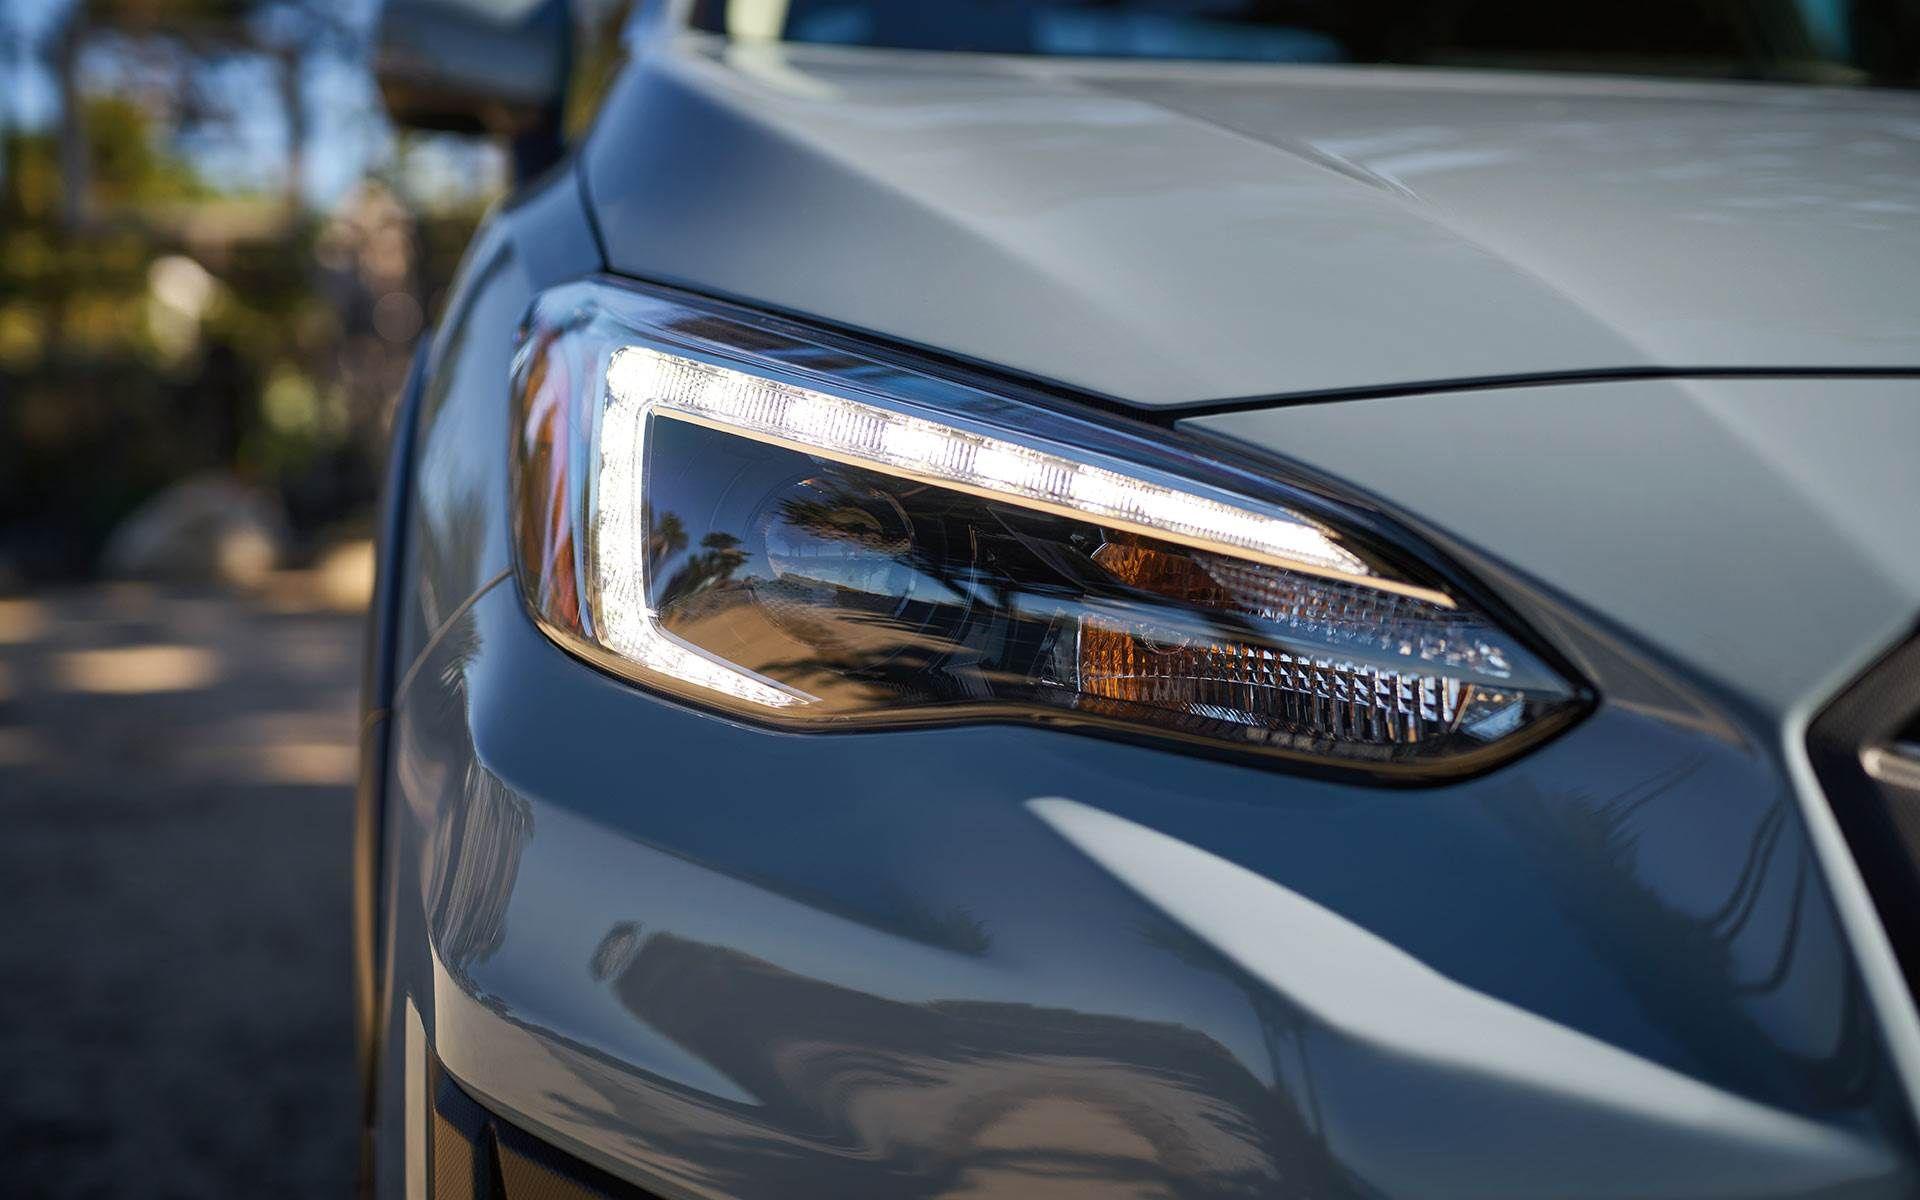 2019 Subaru Crosstrek Subaru crosstrek, Subaru, Car